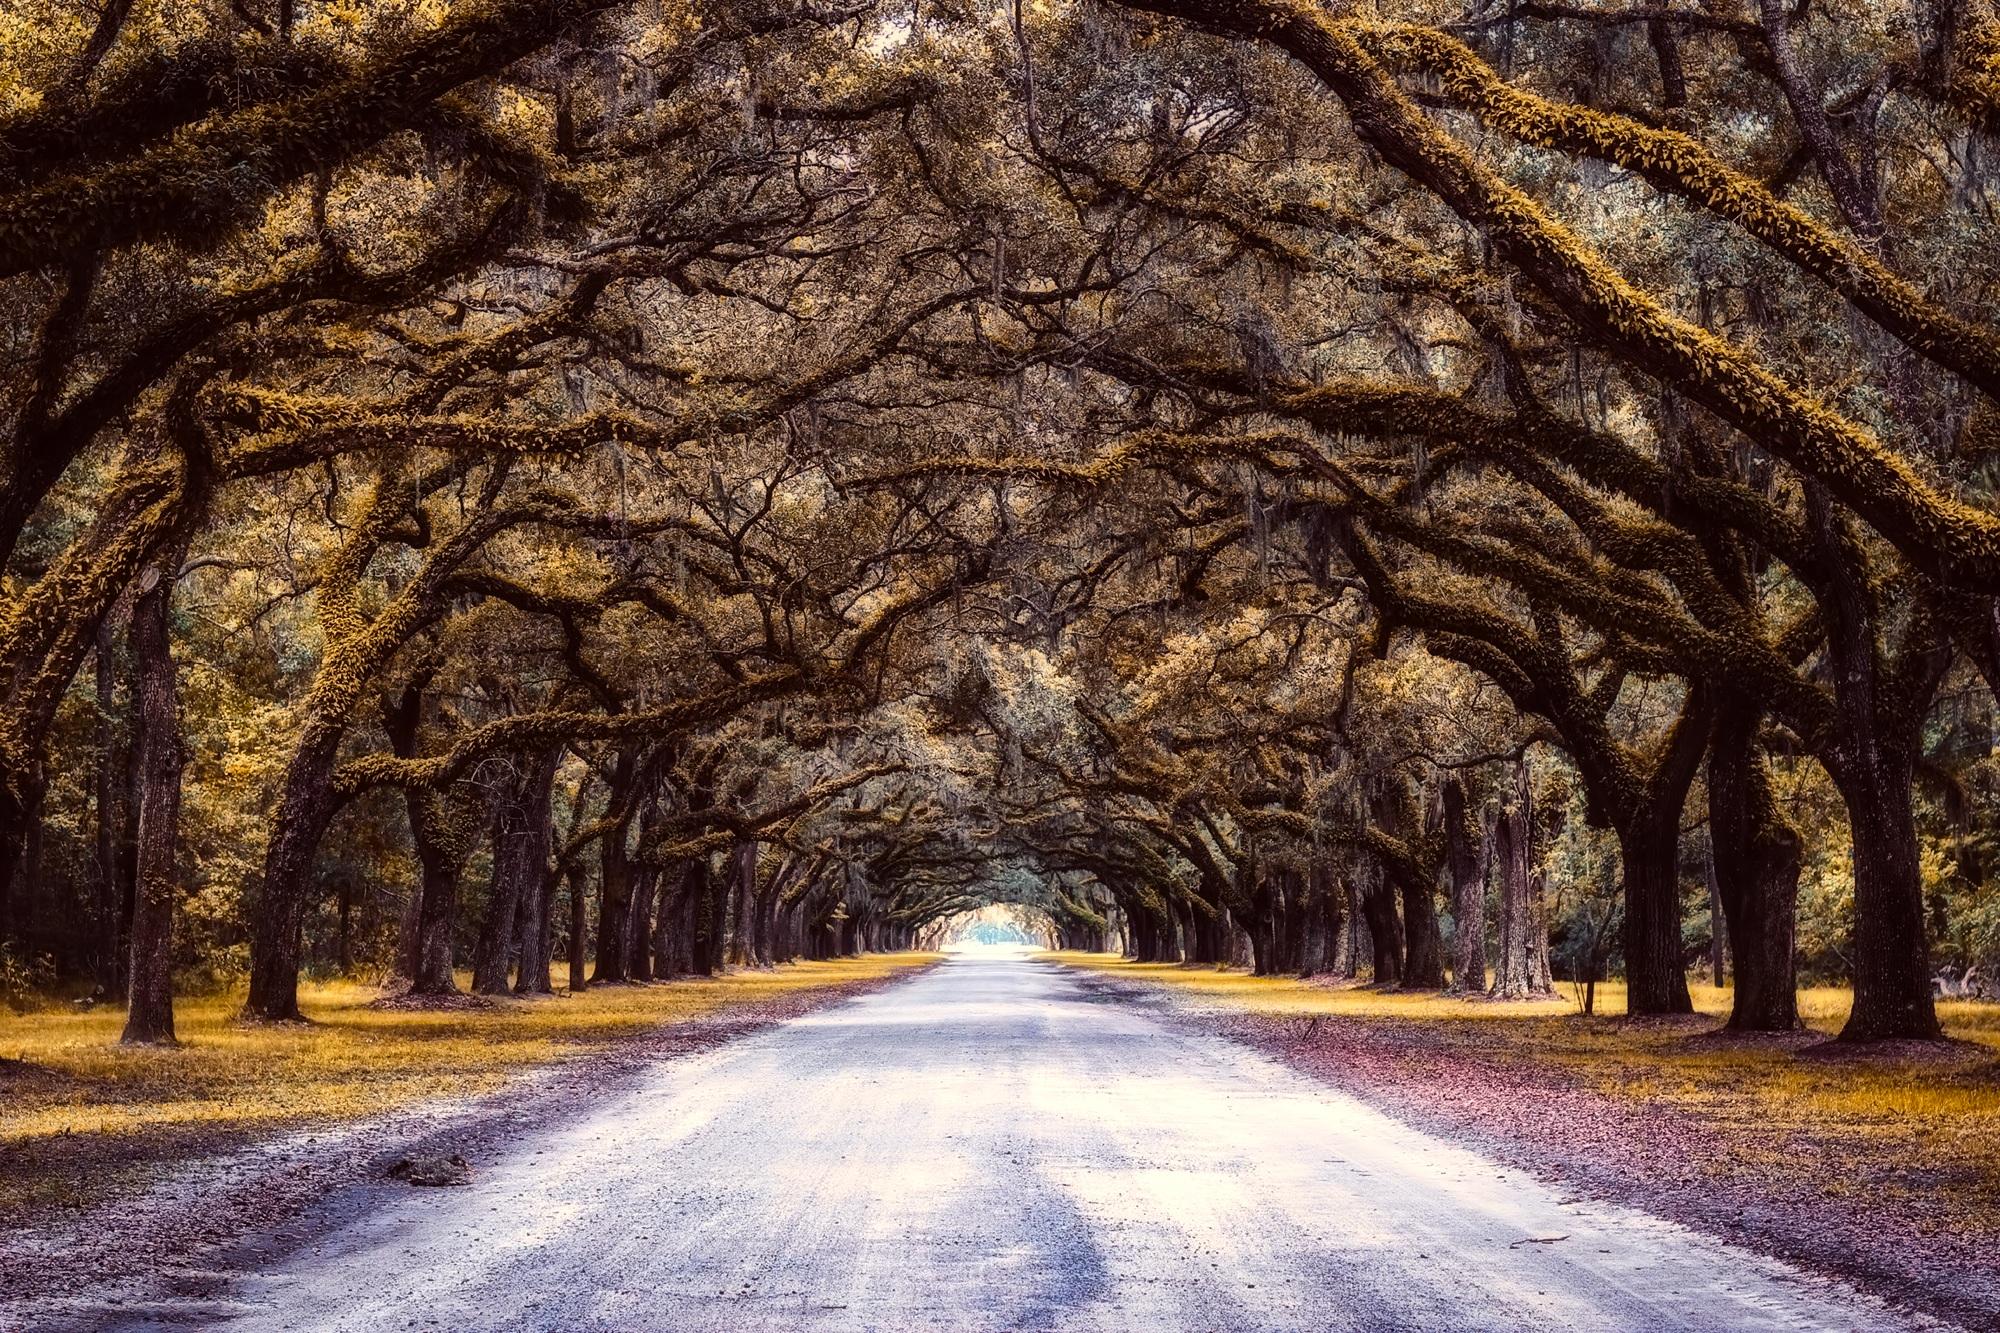 trees-2665947.jpg